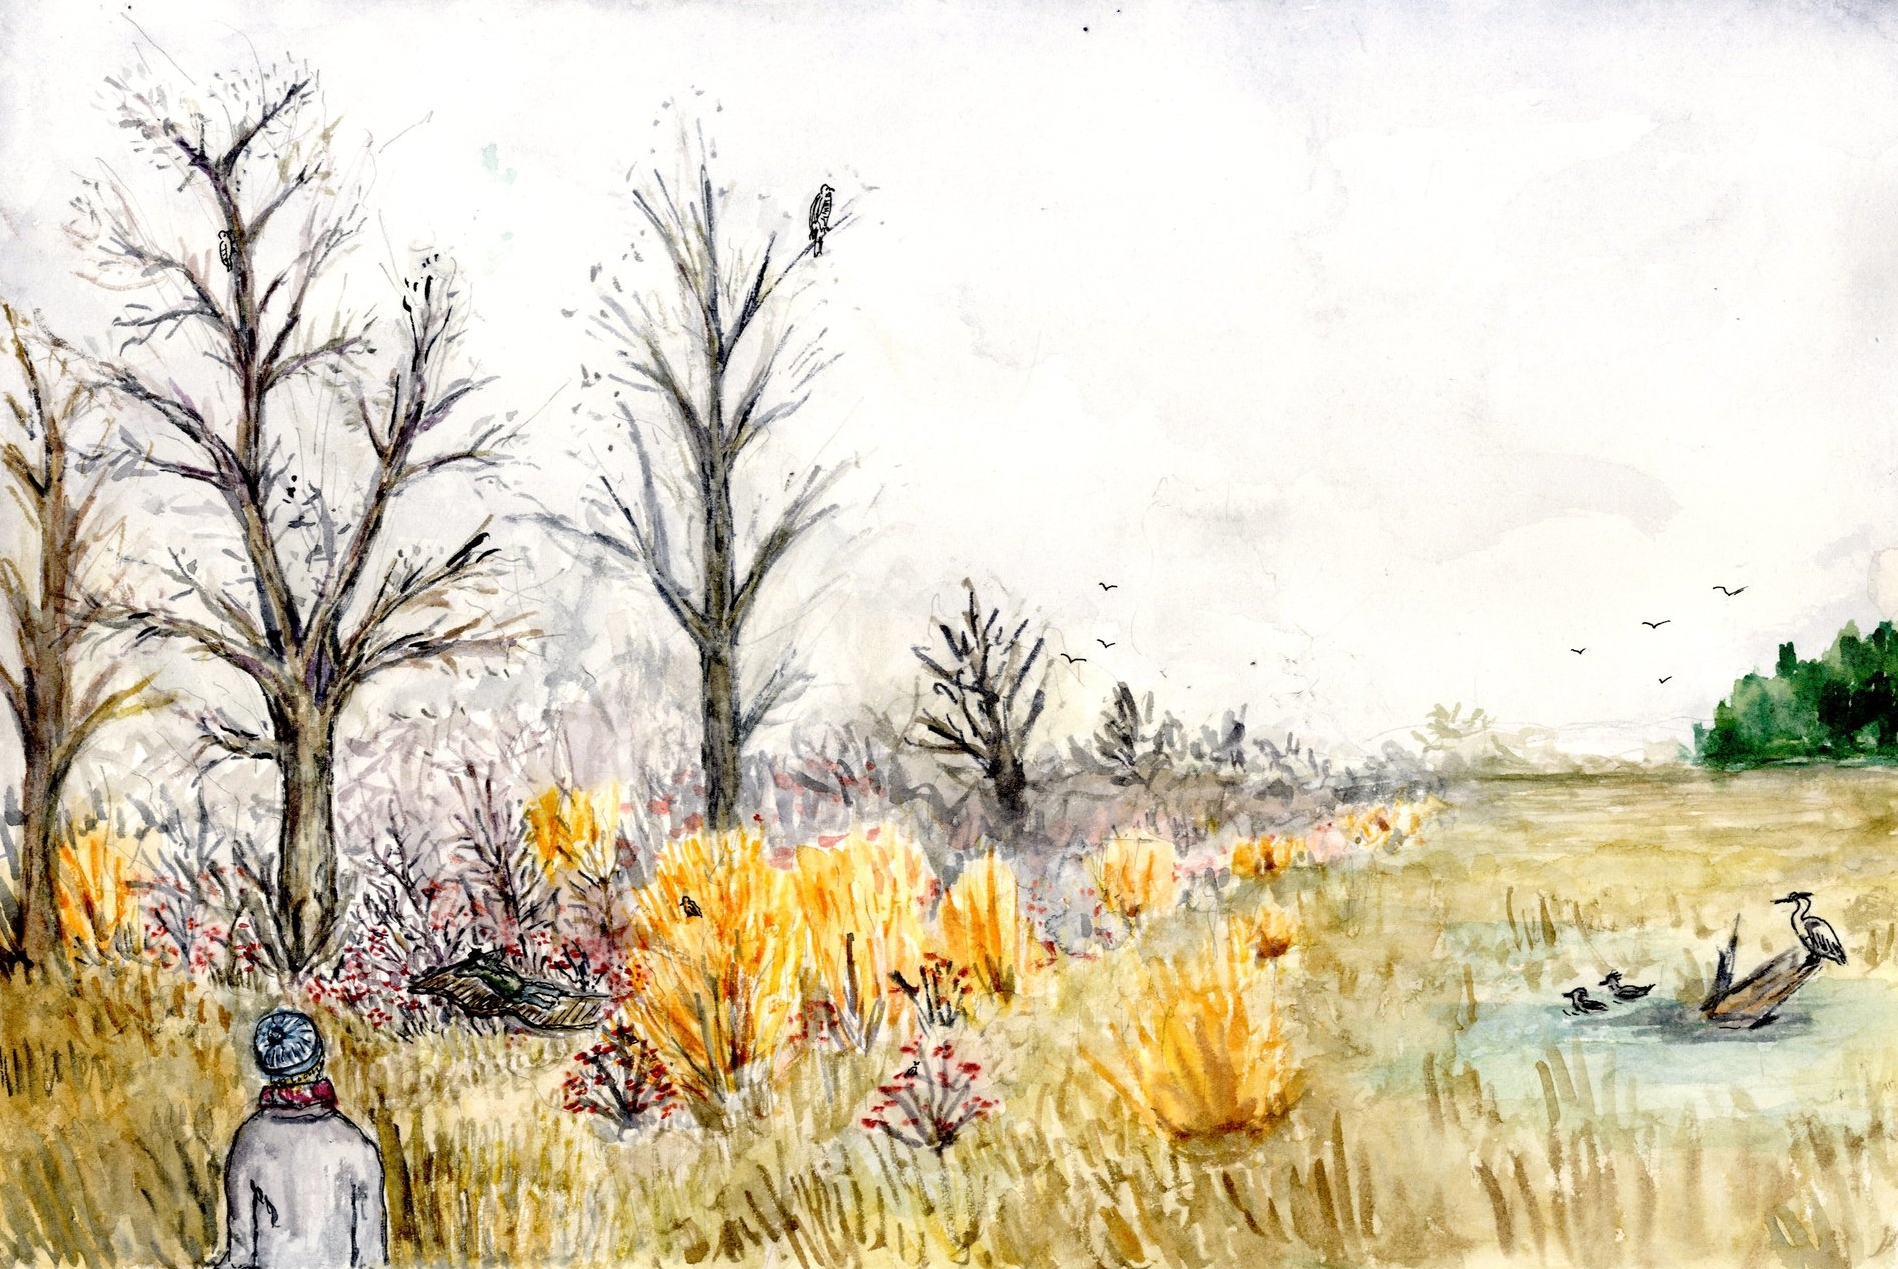 WINTER, RIPARIAN